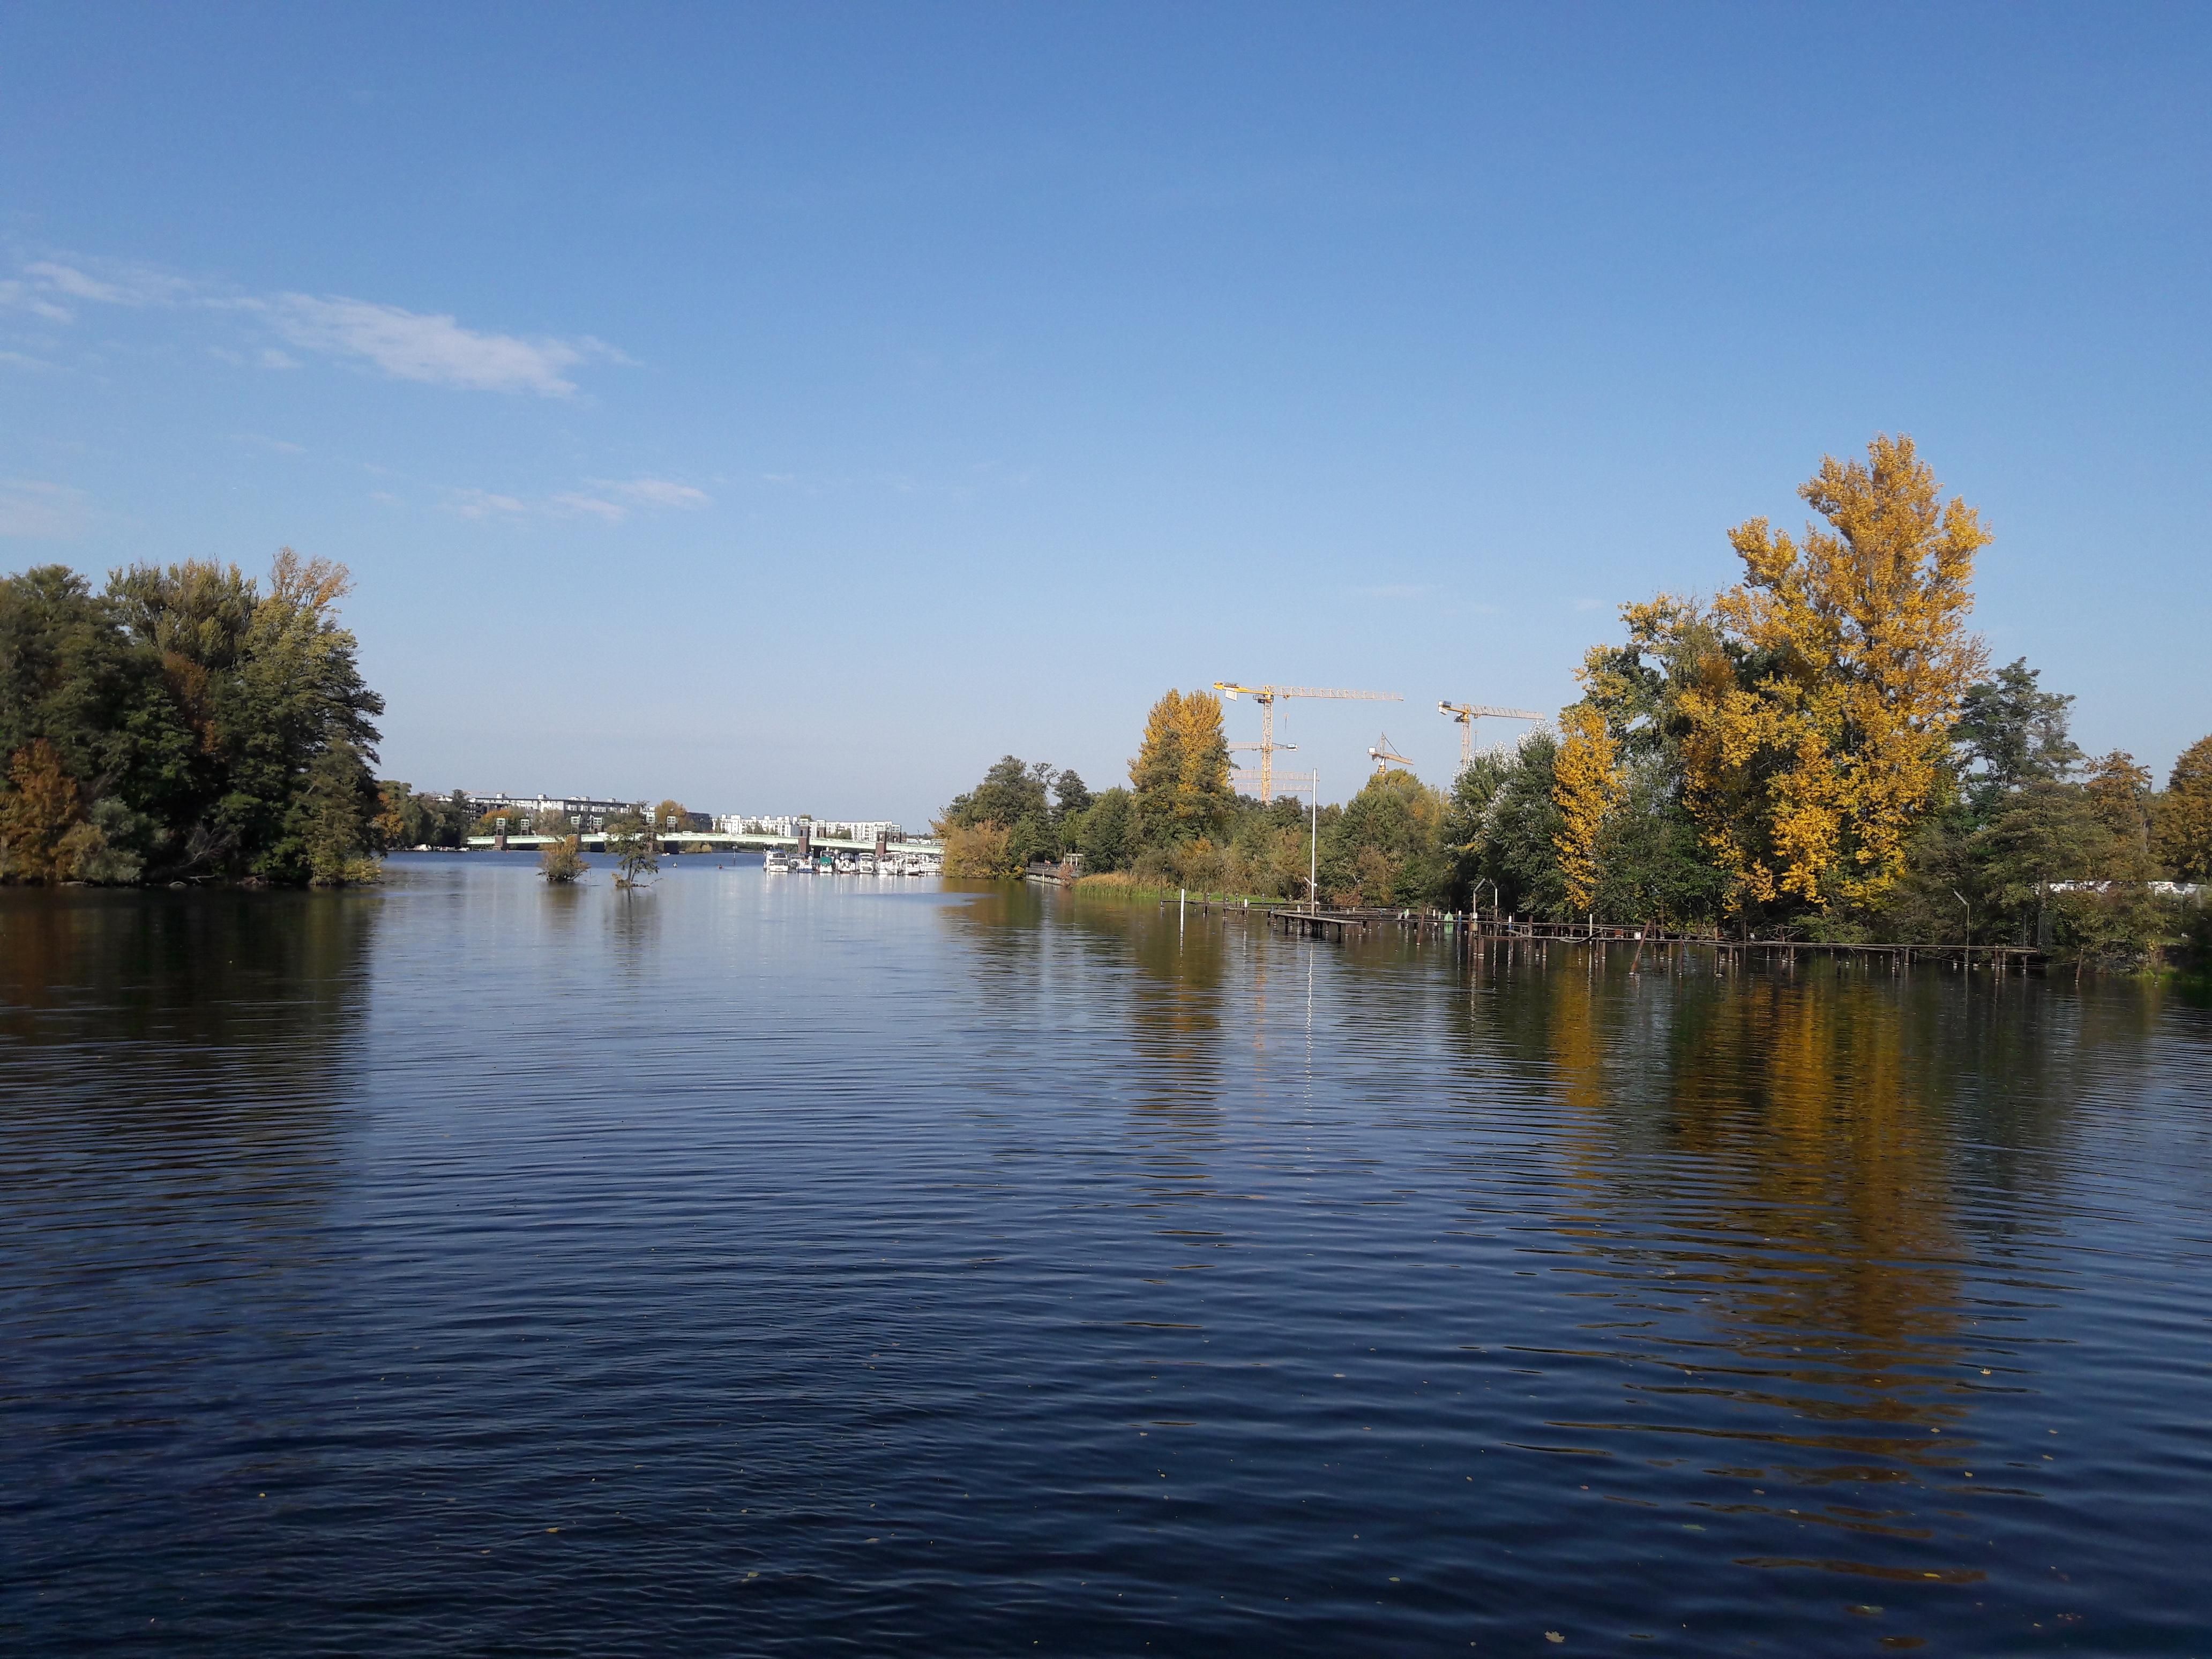 Waterkant-Havel-Neubauquartier.jpg